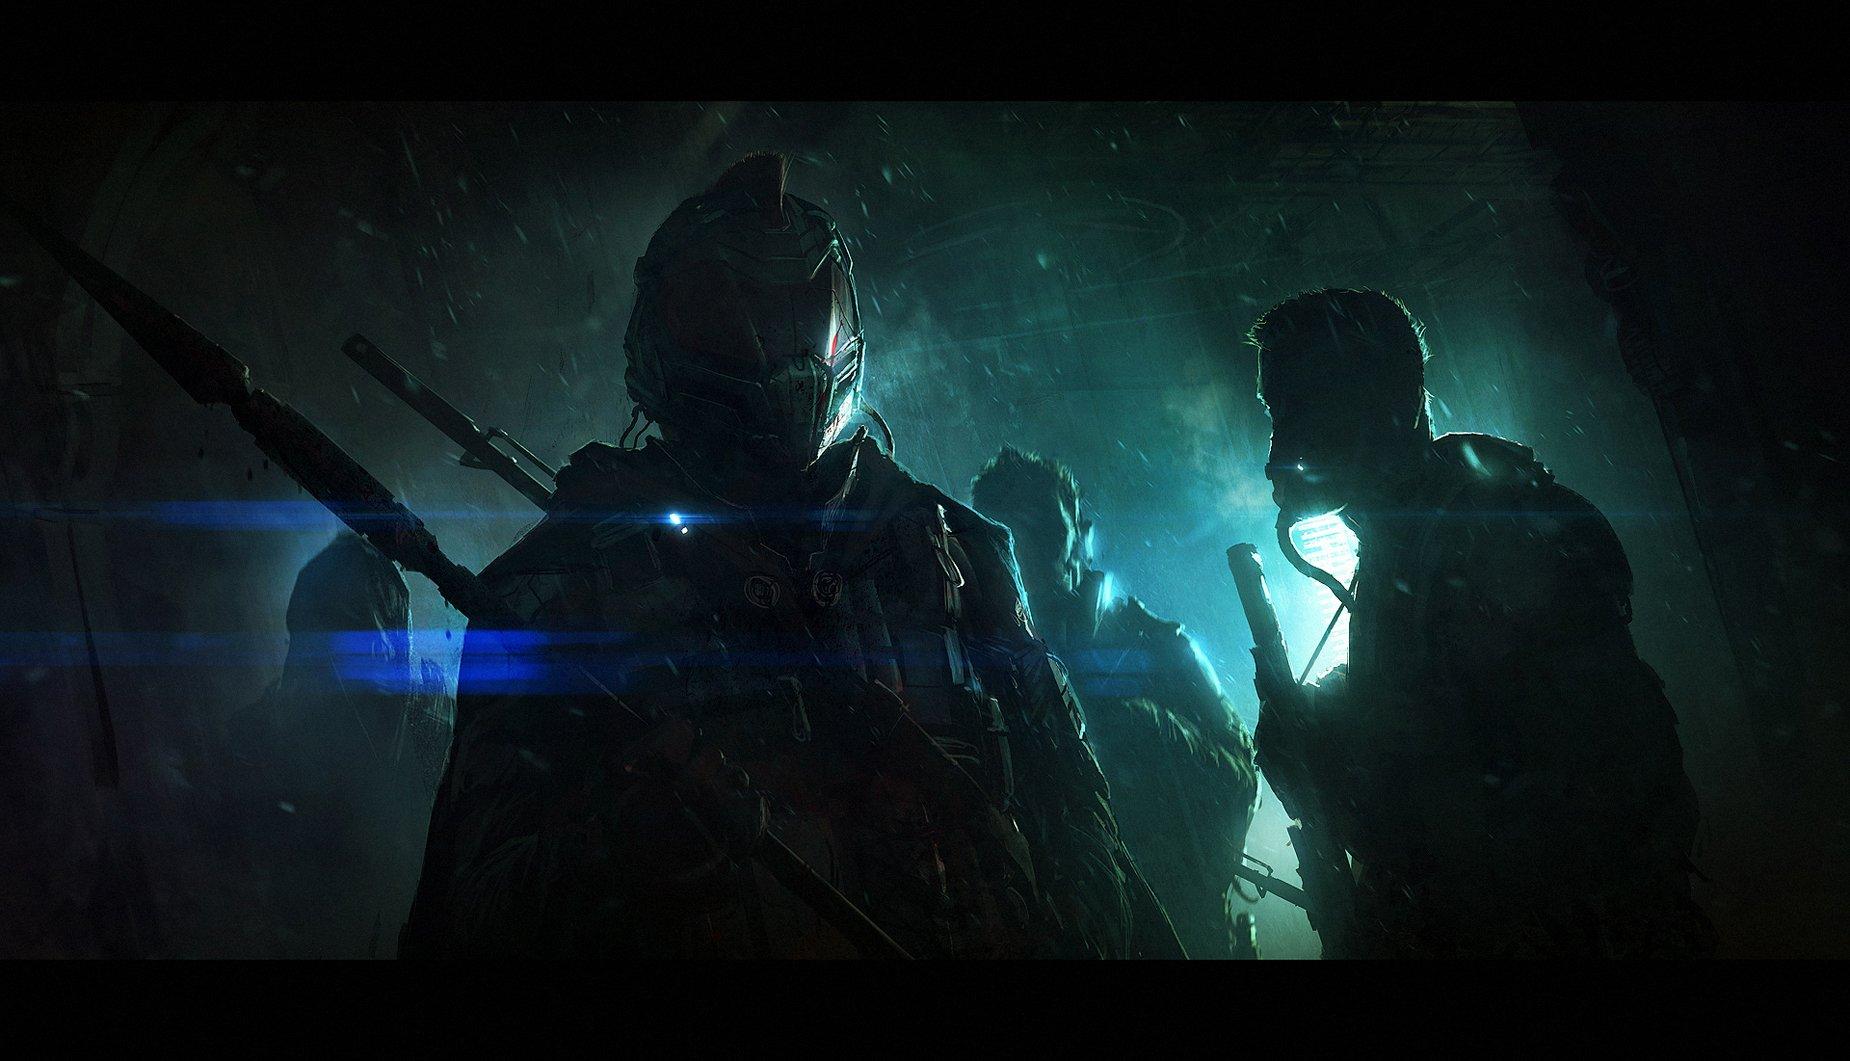 Sci Fi - Warrior  Dark Wallpaper